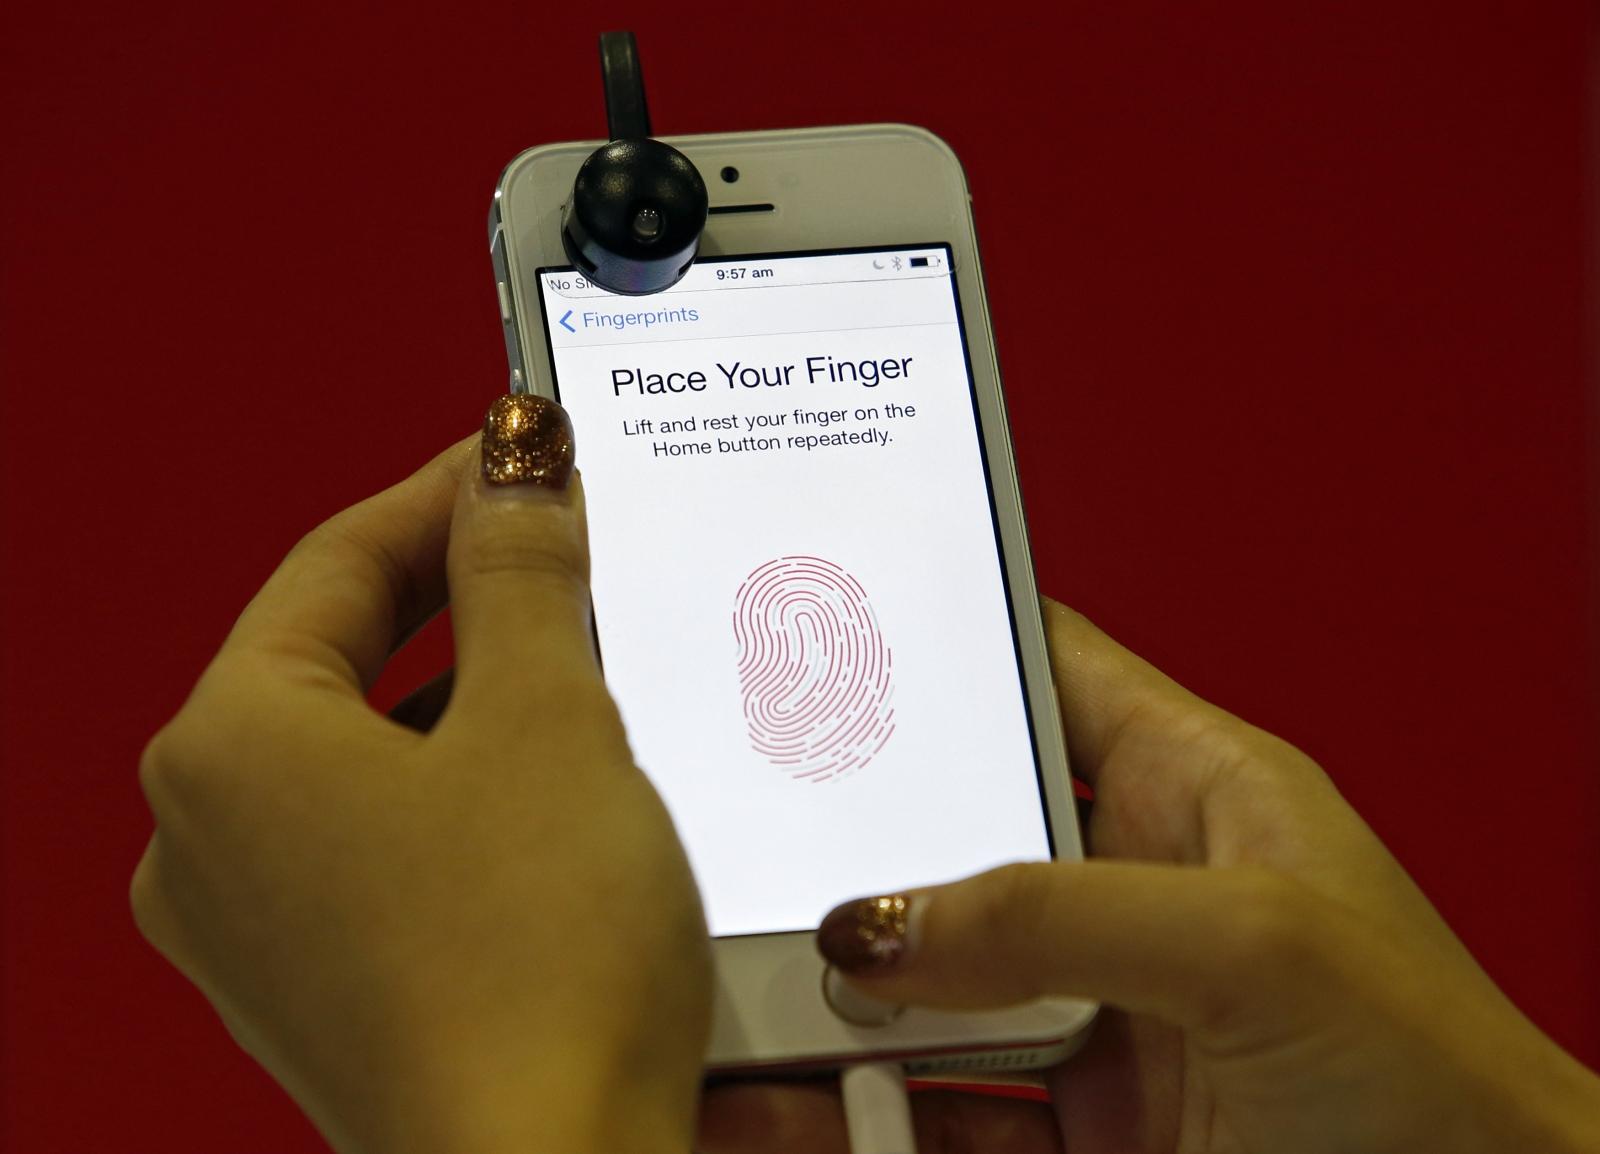 Apple could delay iPhone 8 for fingerprint